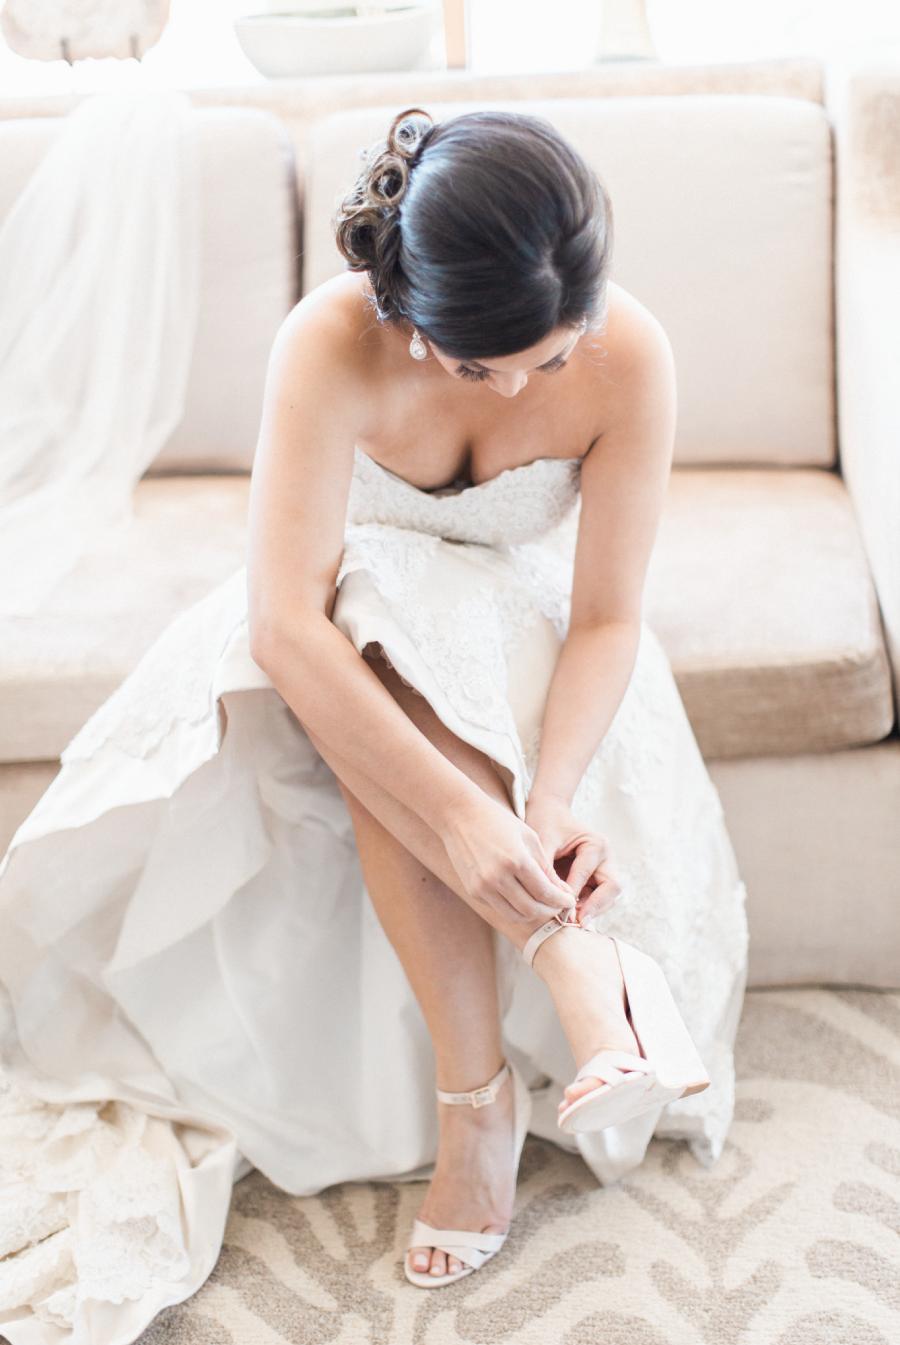 Las Vegas Mobile Makeup Artist Weddings Bridal Asian